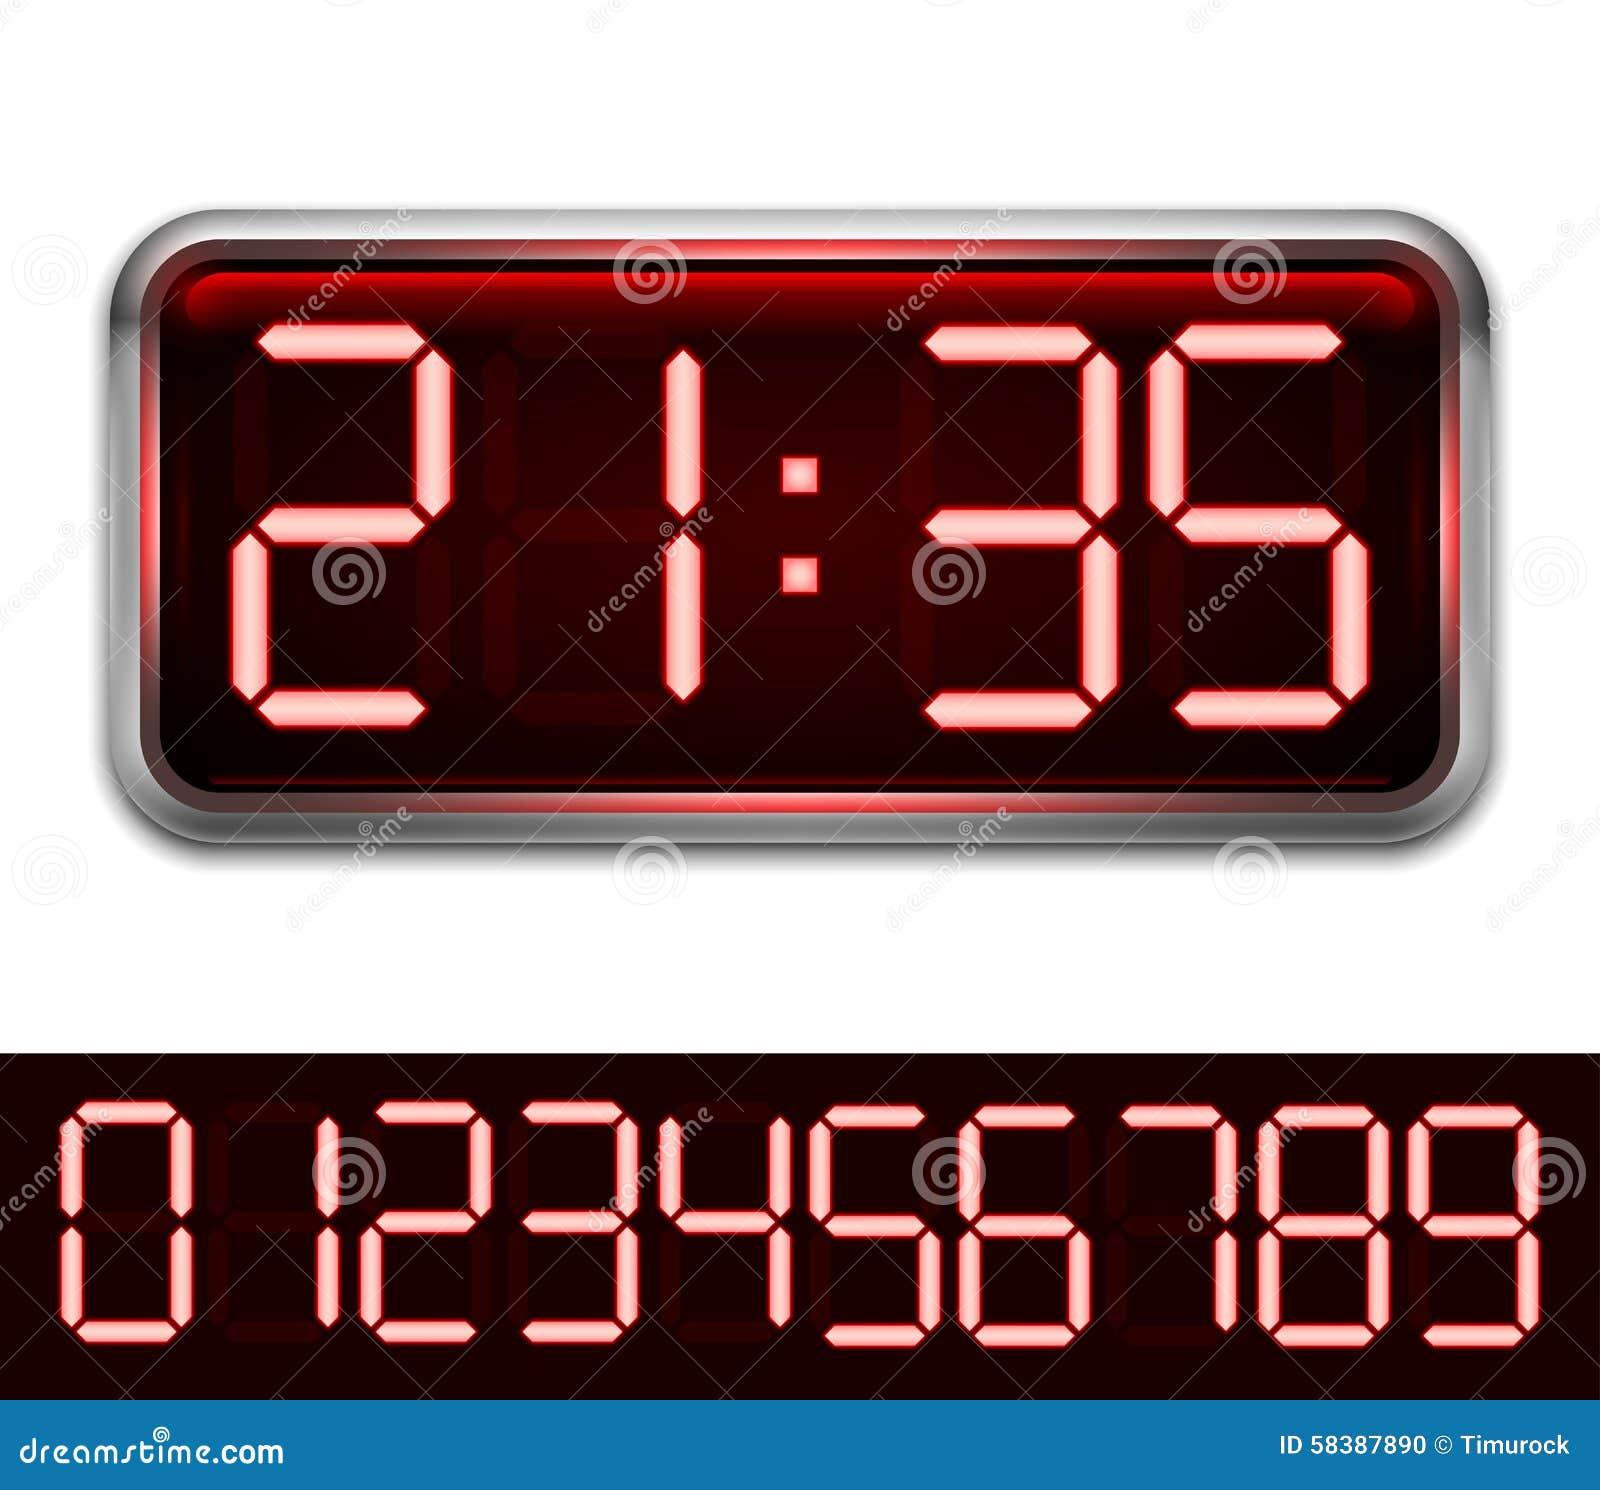 Red Digital Clock Stock Vector Illustration Of Concept